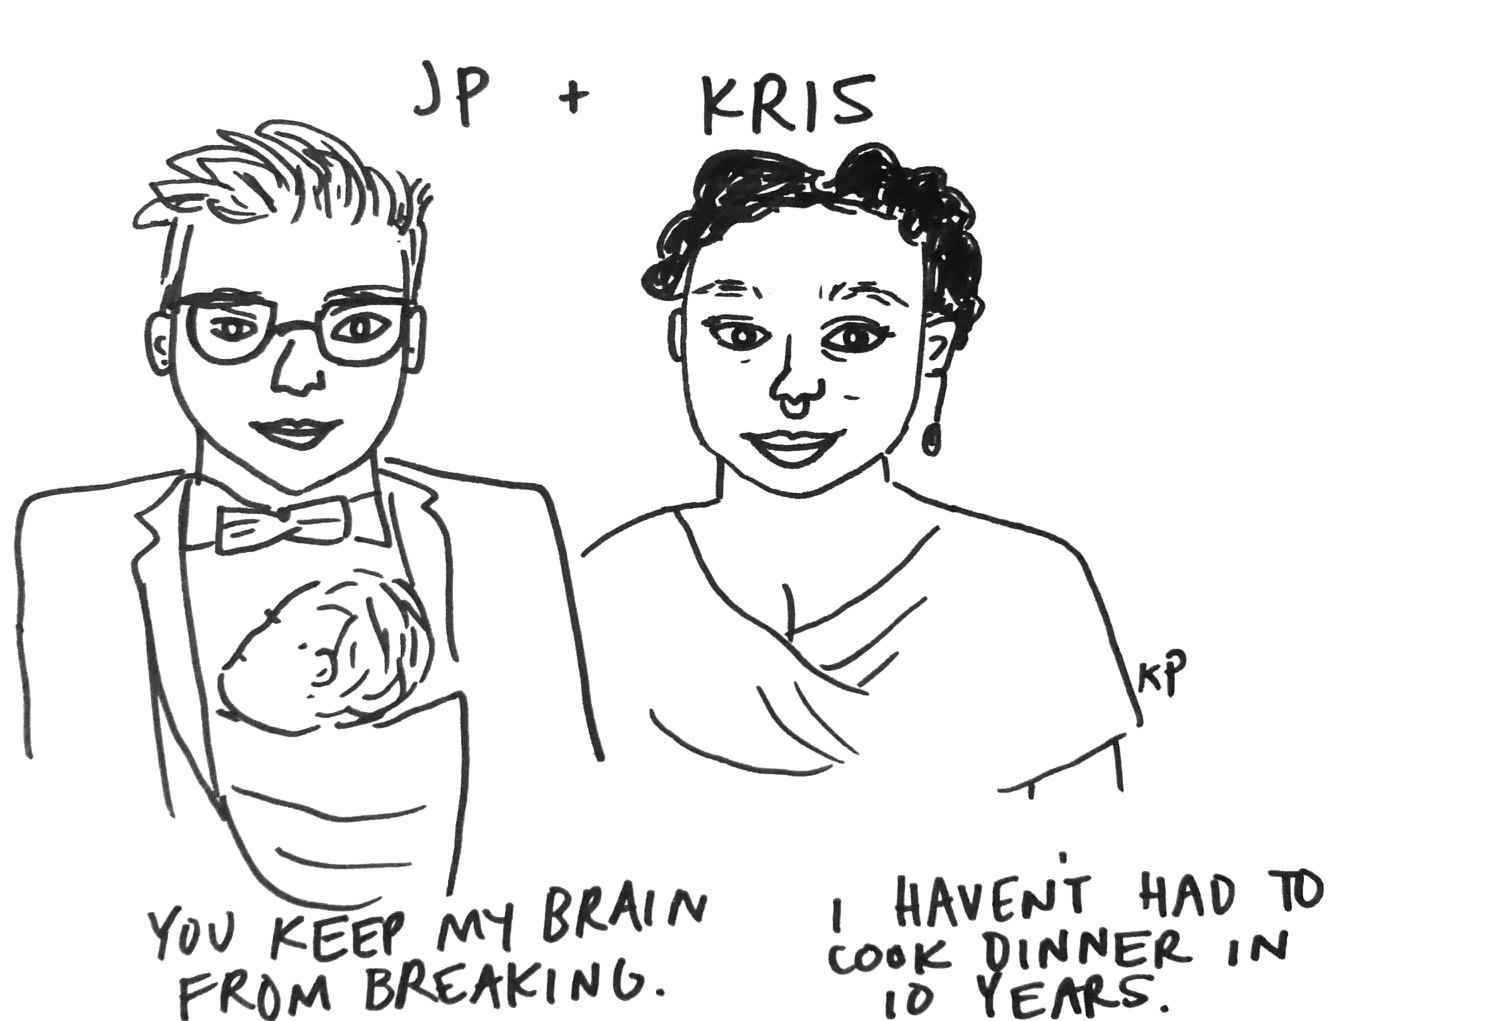 JP + Kris.jpg